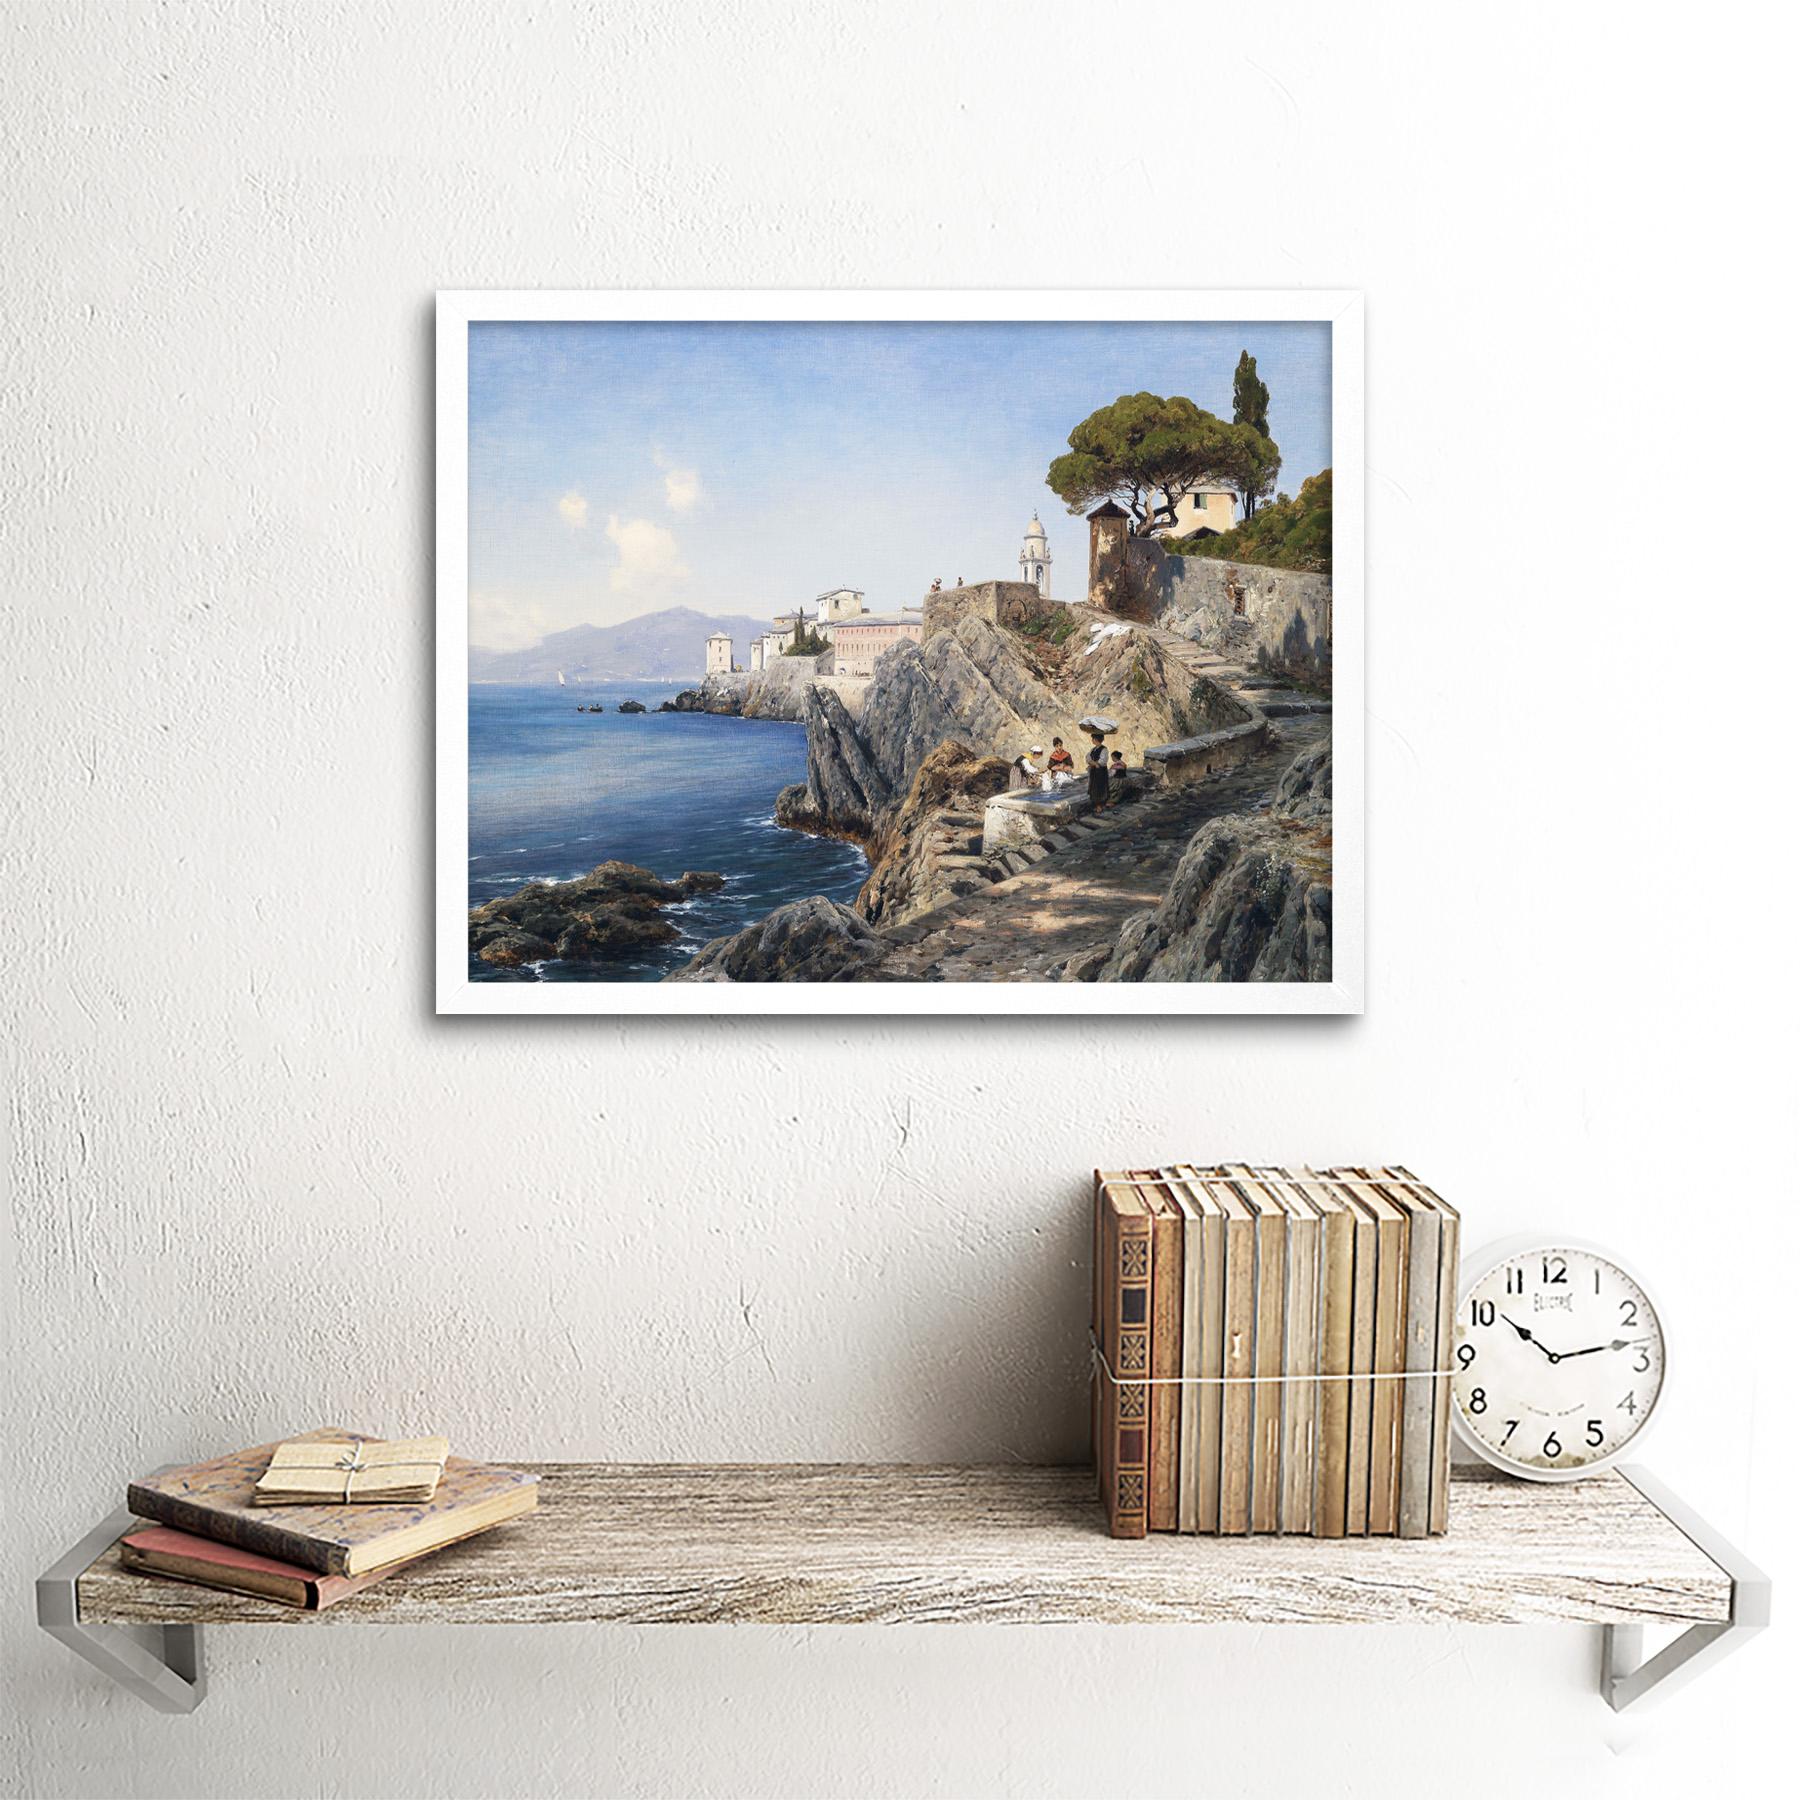 Lutteroth-Sturla-Shore-Genoa-Italy-Seascape-Painting-Art-Print-Framed-12x16 thumbnail 18